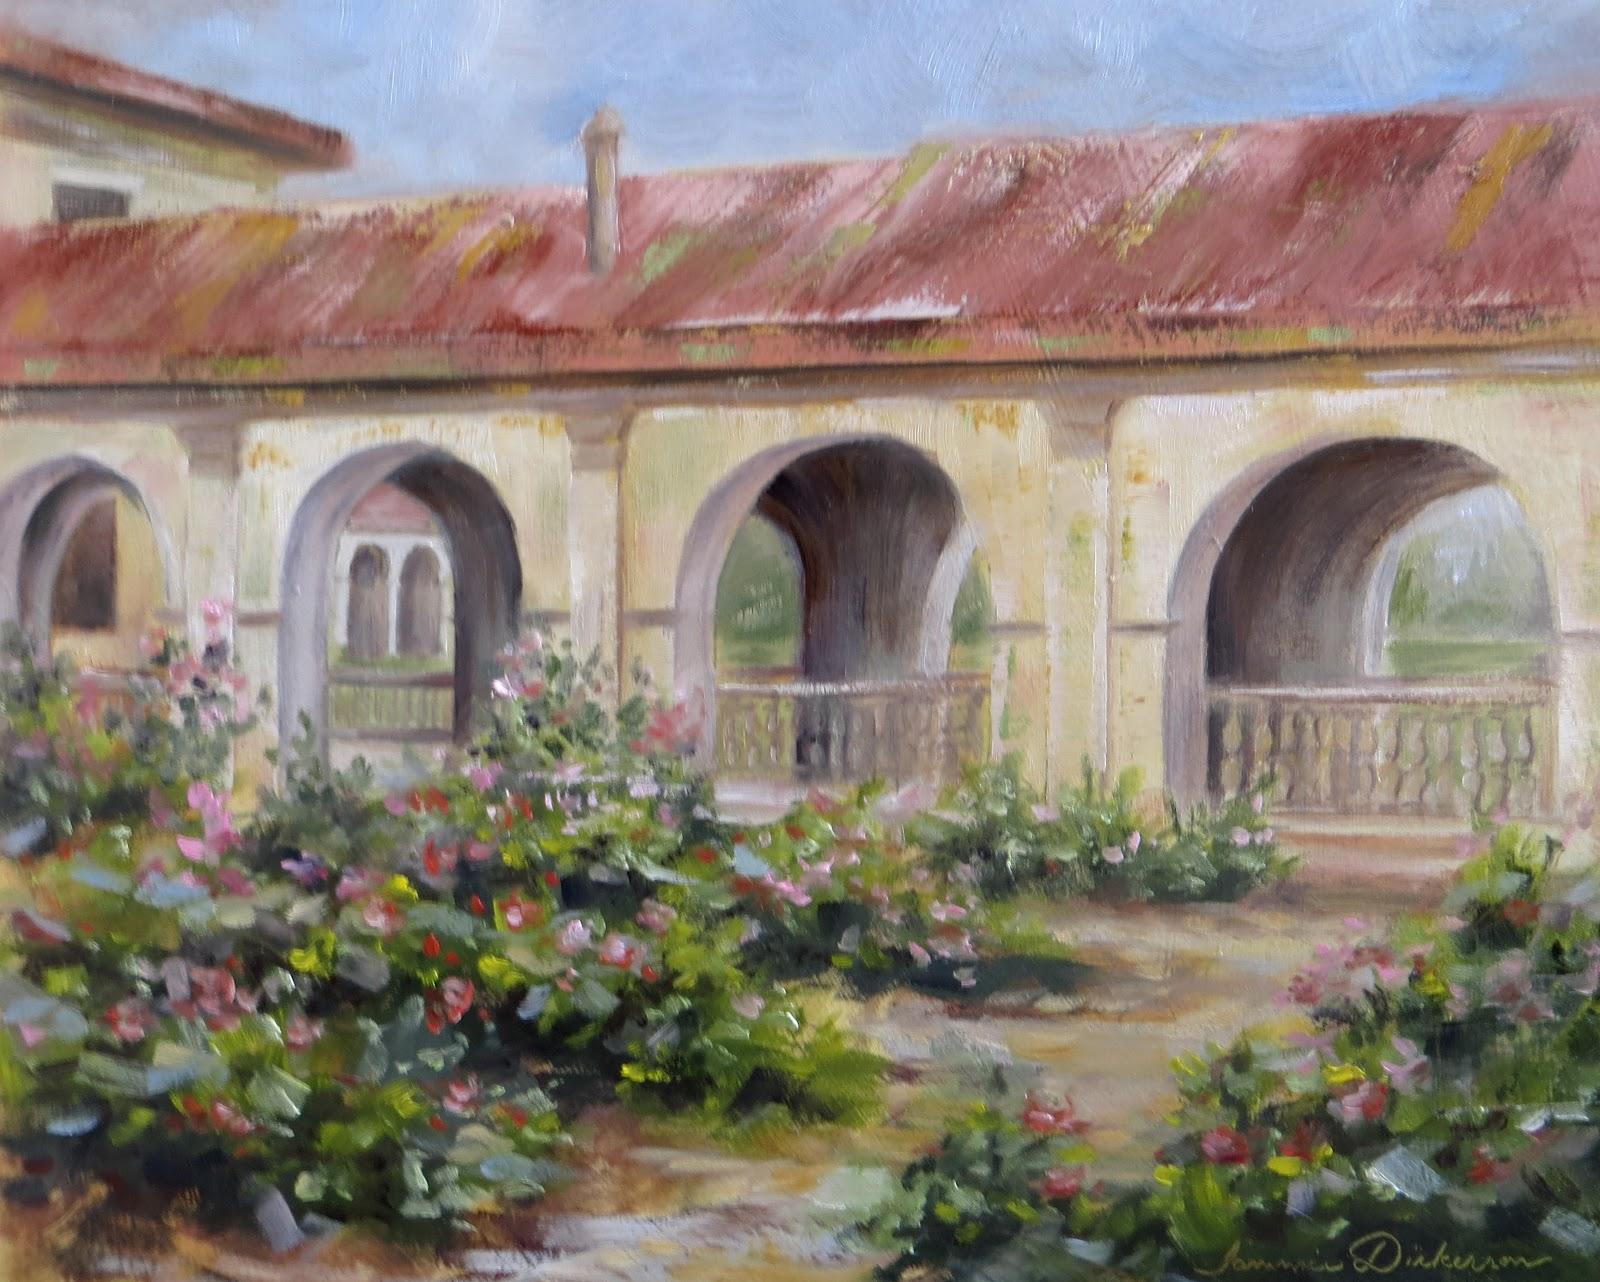 tammie dickerson 39 s artistic journey rose garden sanctuary